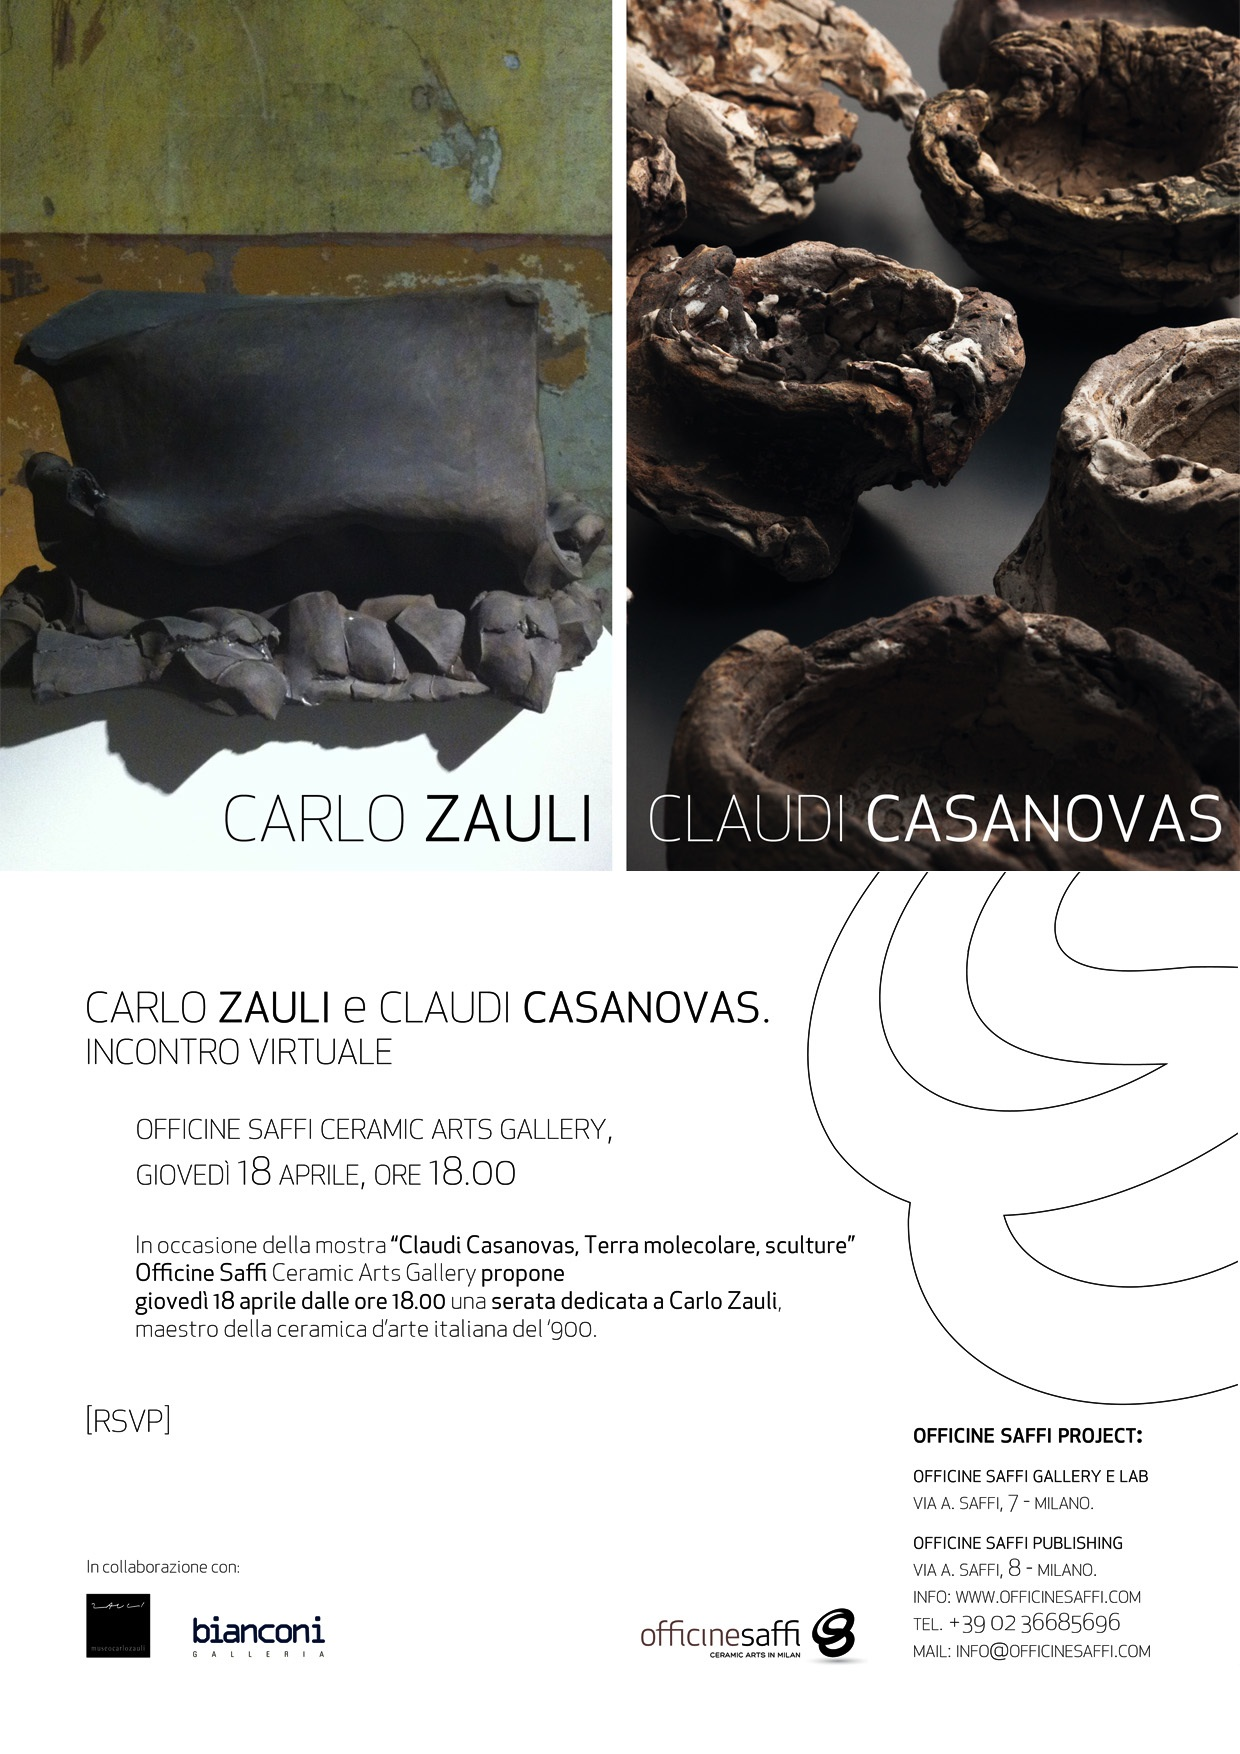 Incontro virtuale alle Officine Saffi Ceramic Arts Gallery